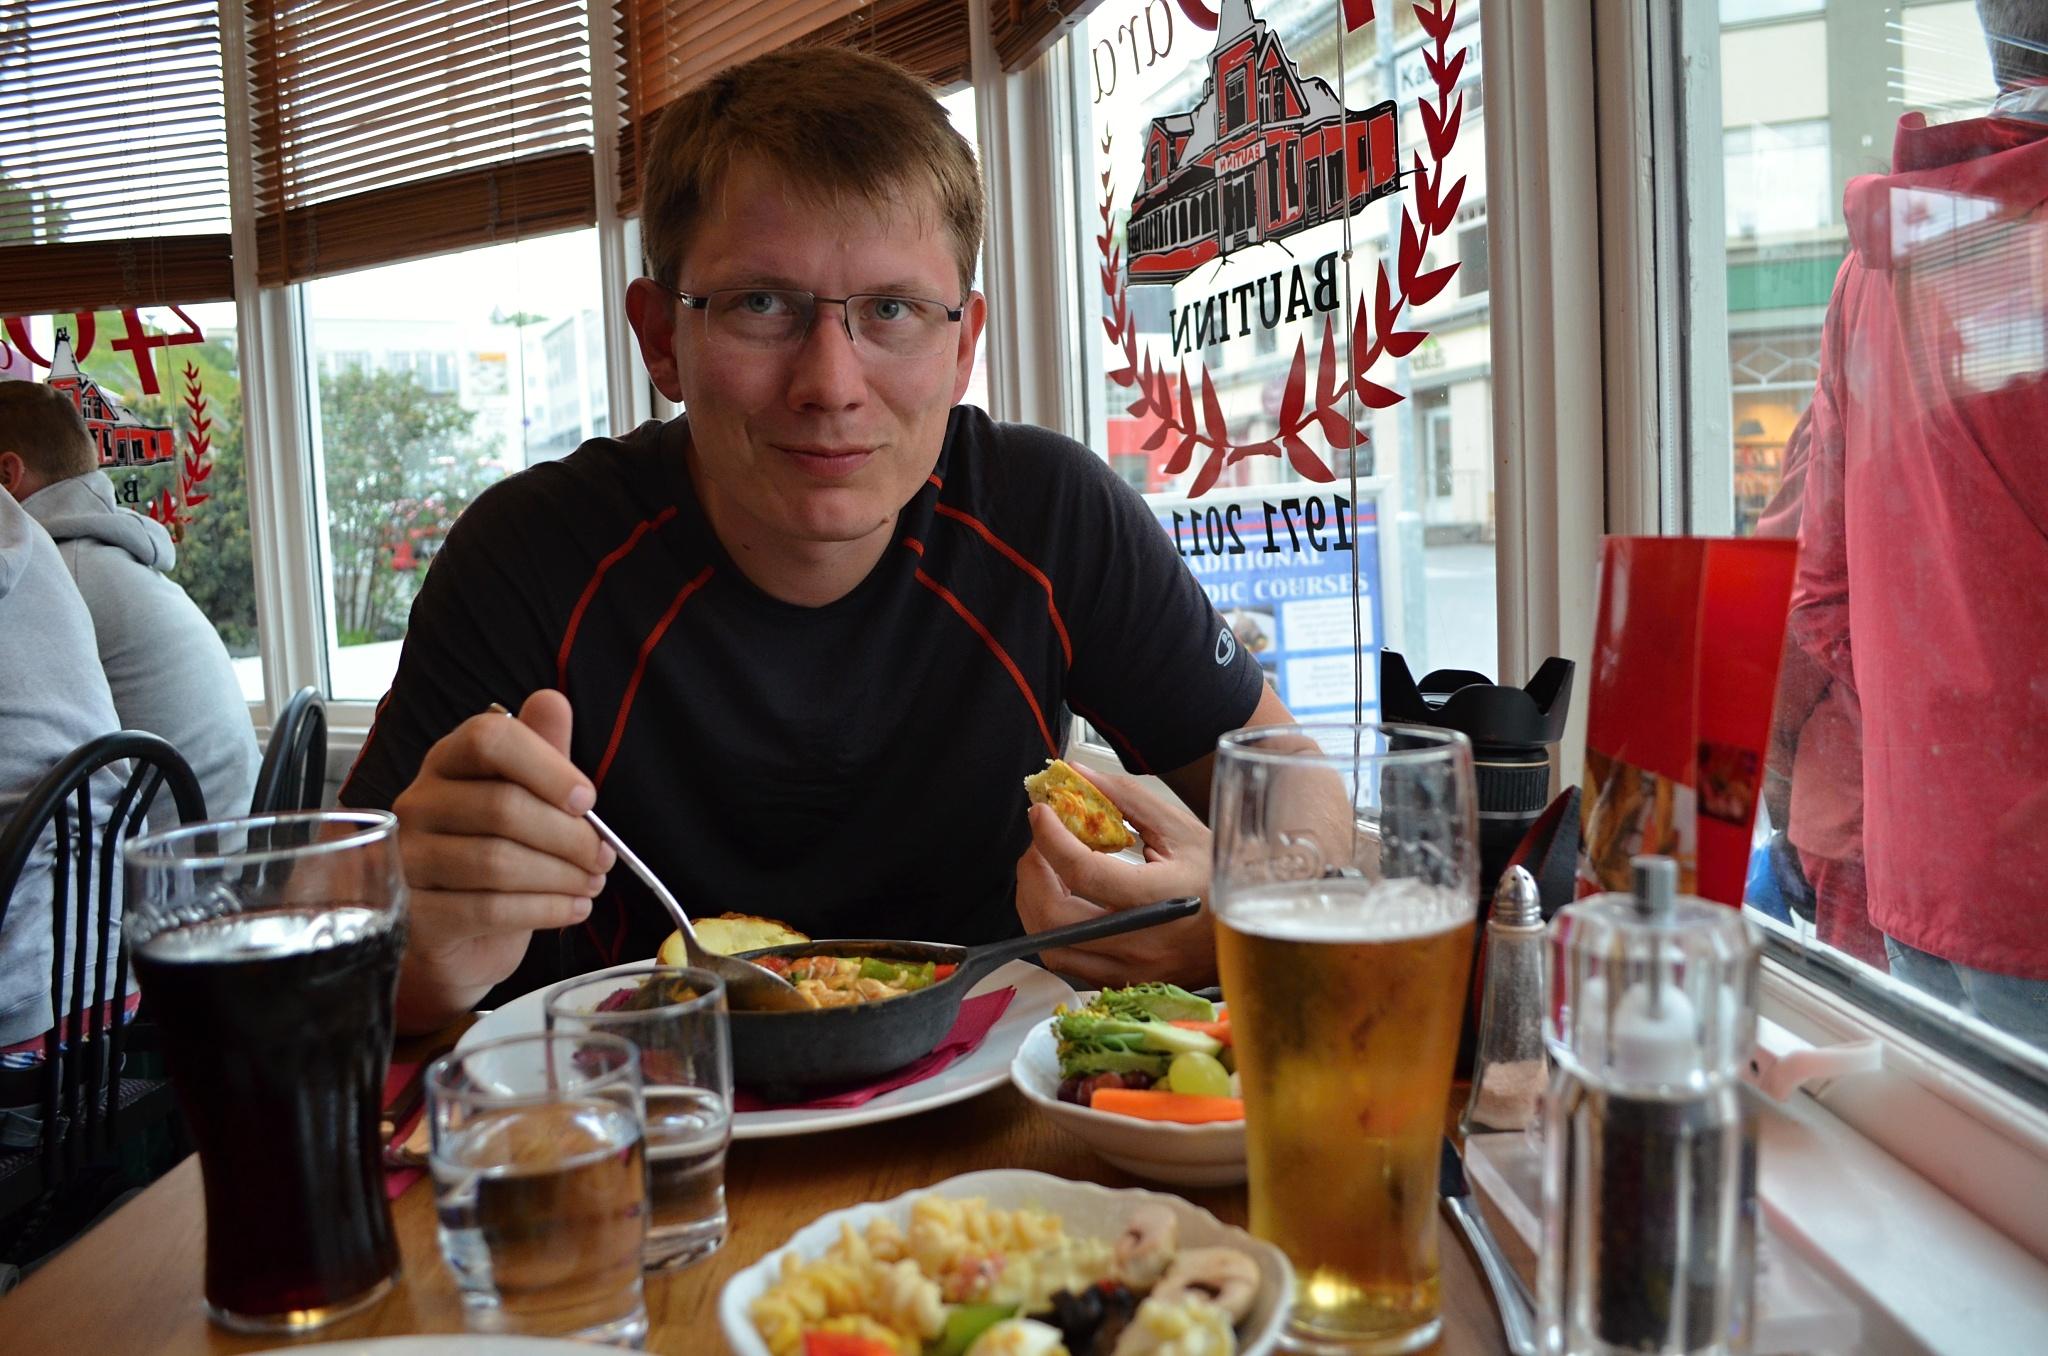 Večeře v restauraci Bautinn